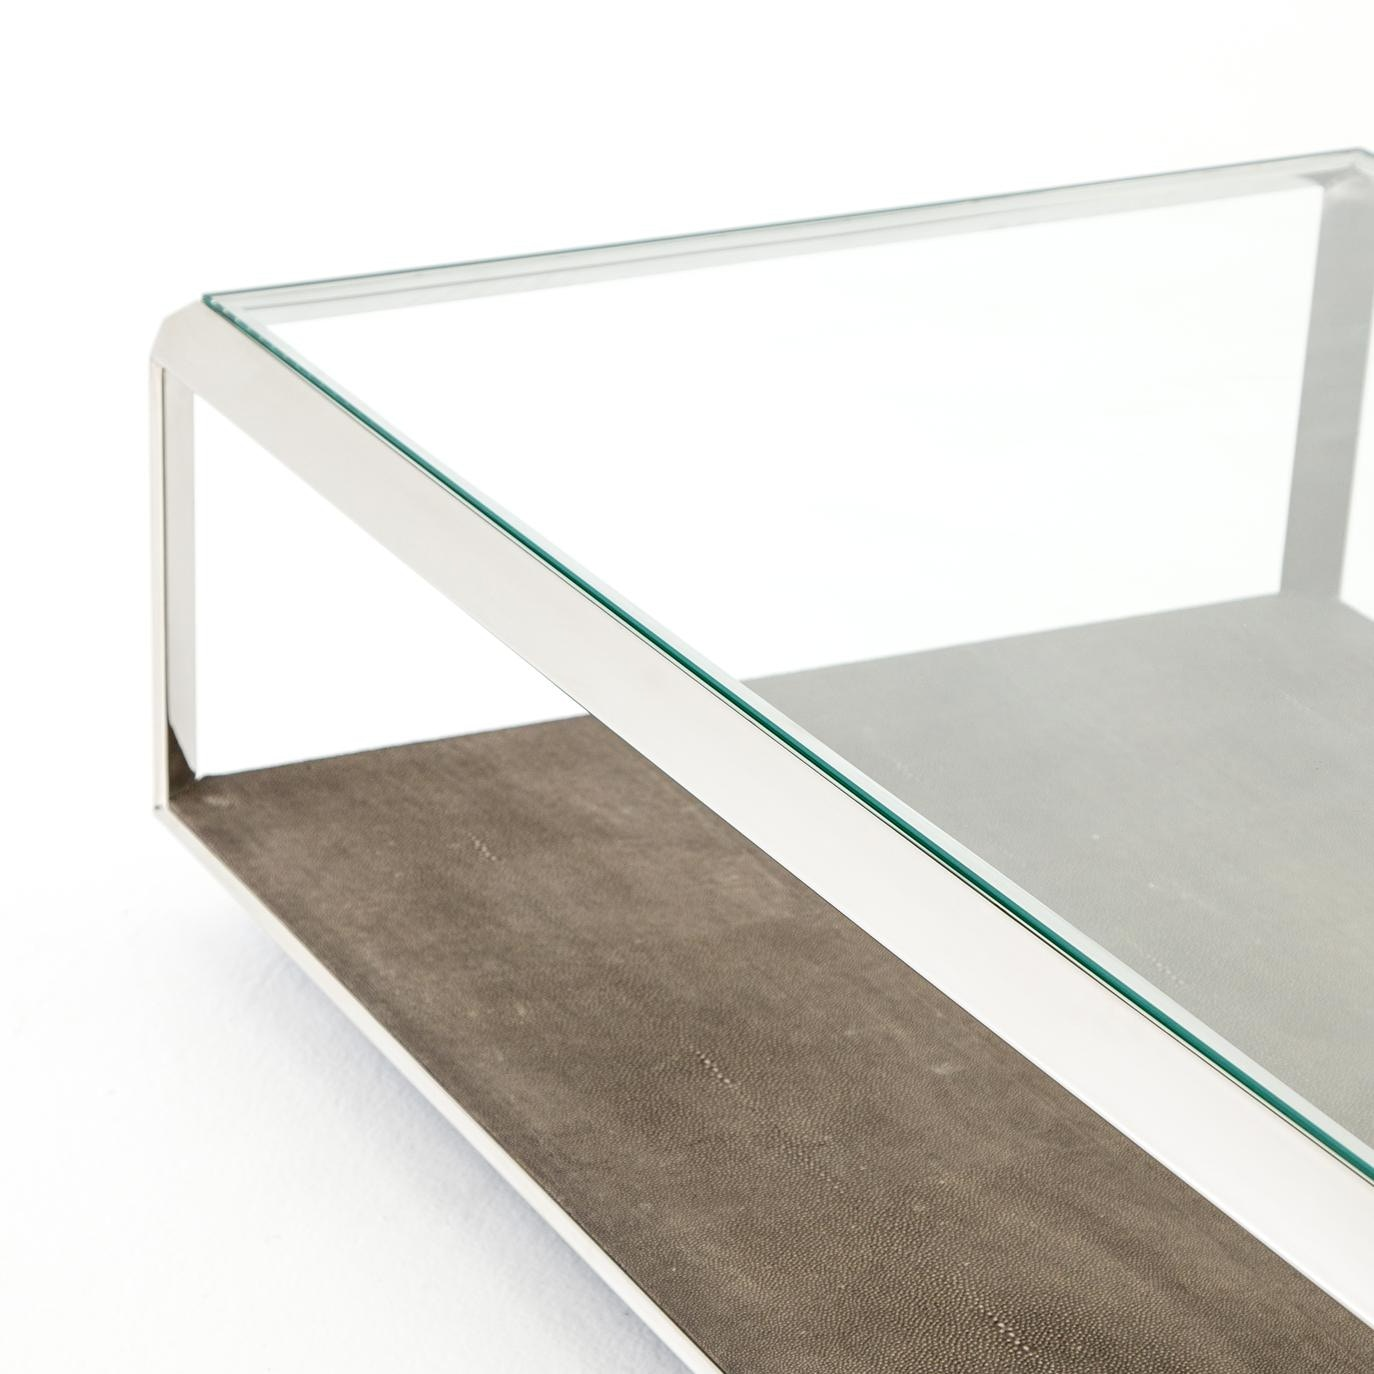 Four Hands Shagreen Shadow Box Coffee Table VBEN016 VBEN016